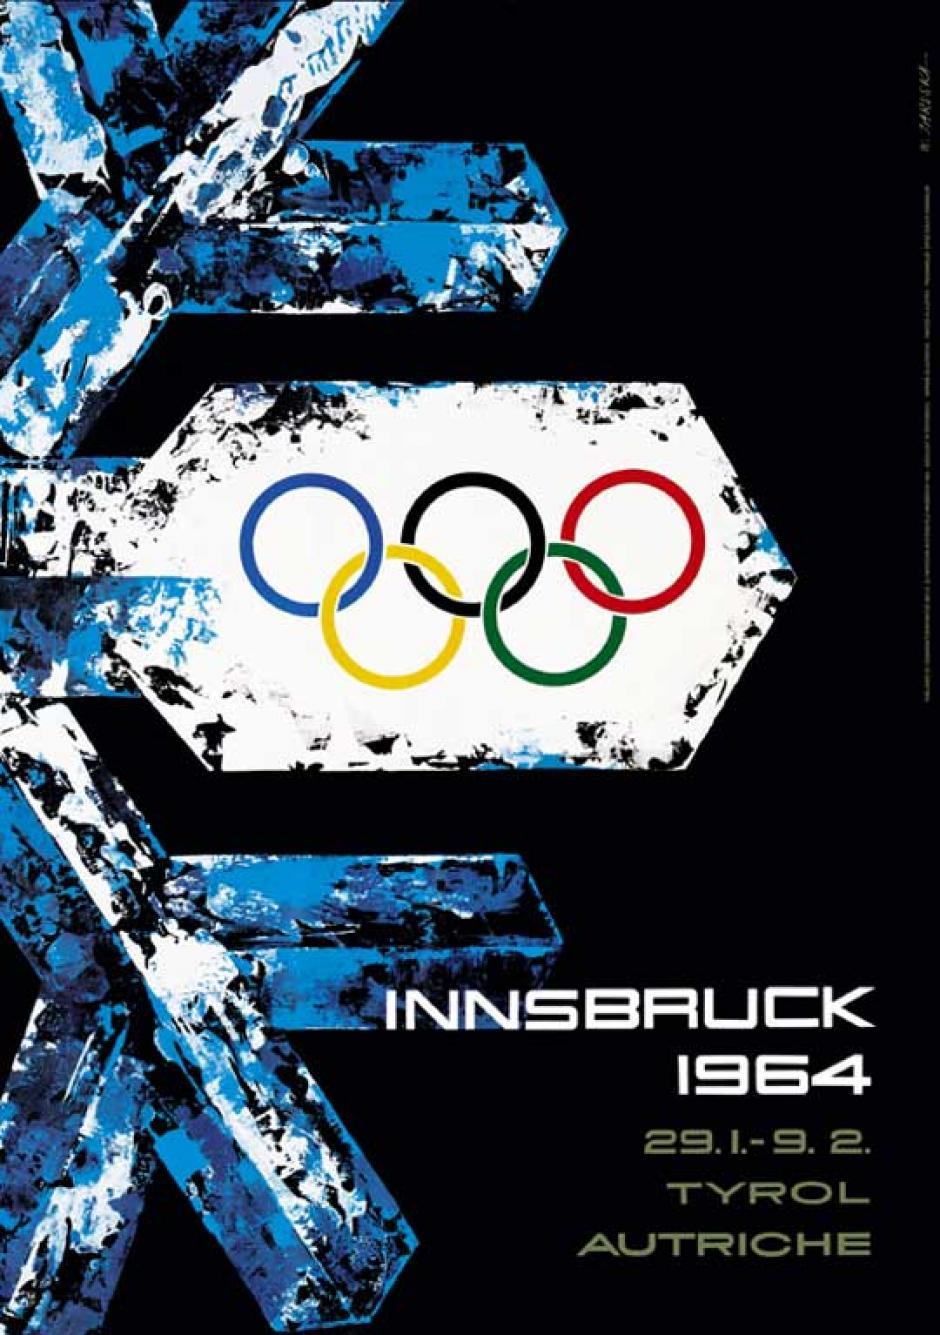 Innsbruck, Austria la sede de 1964.